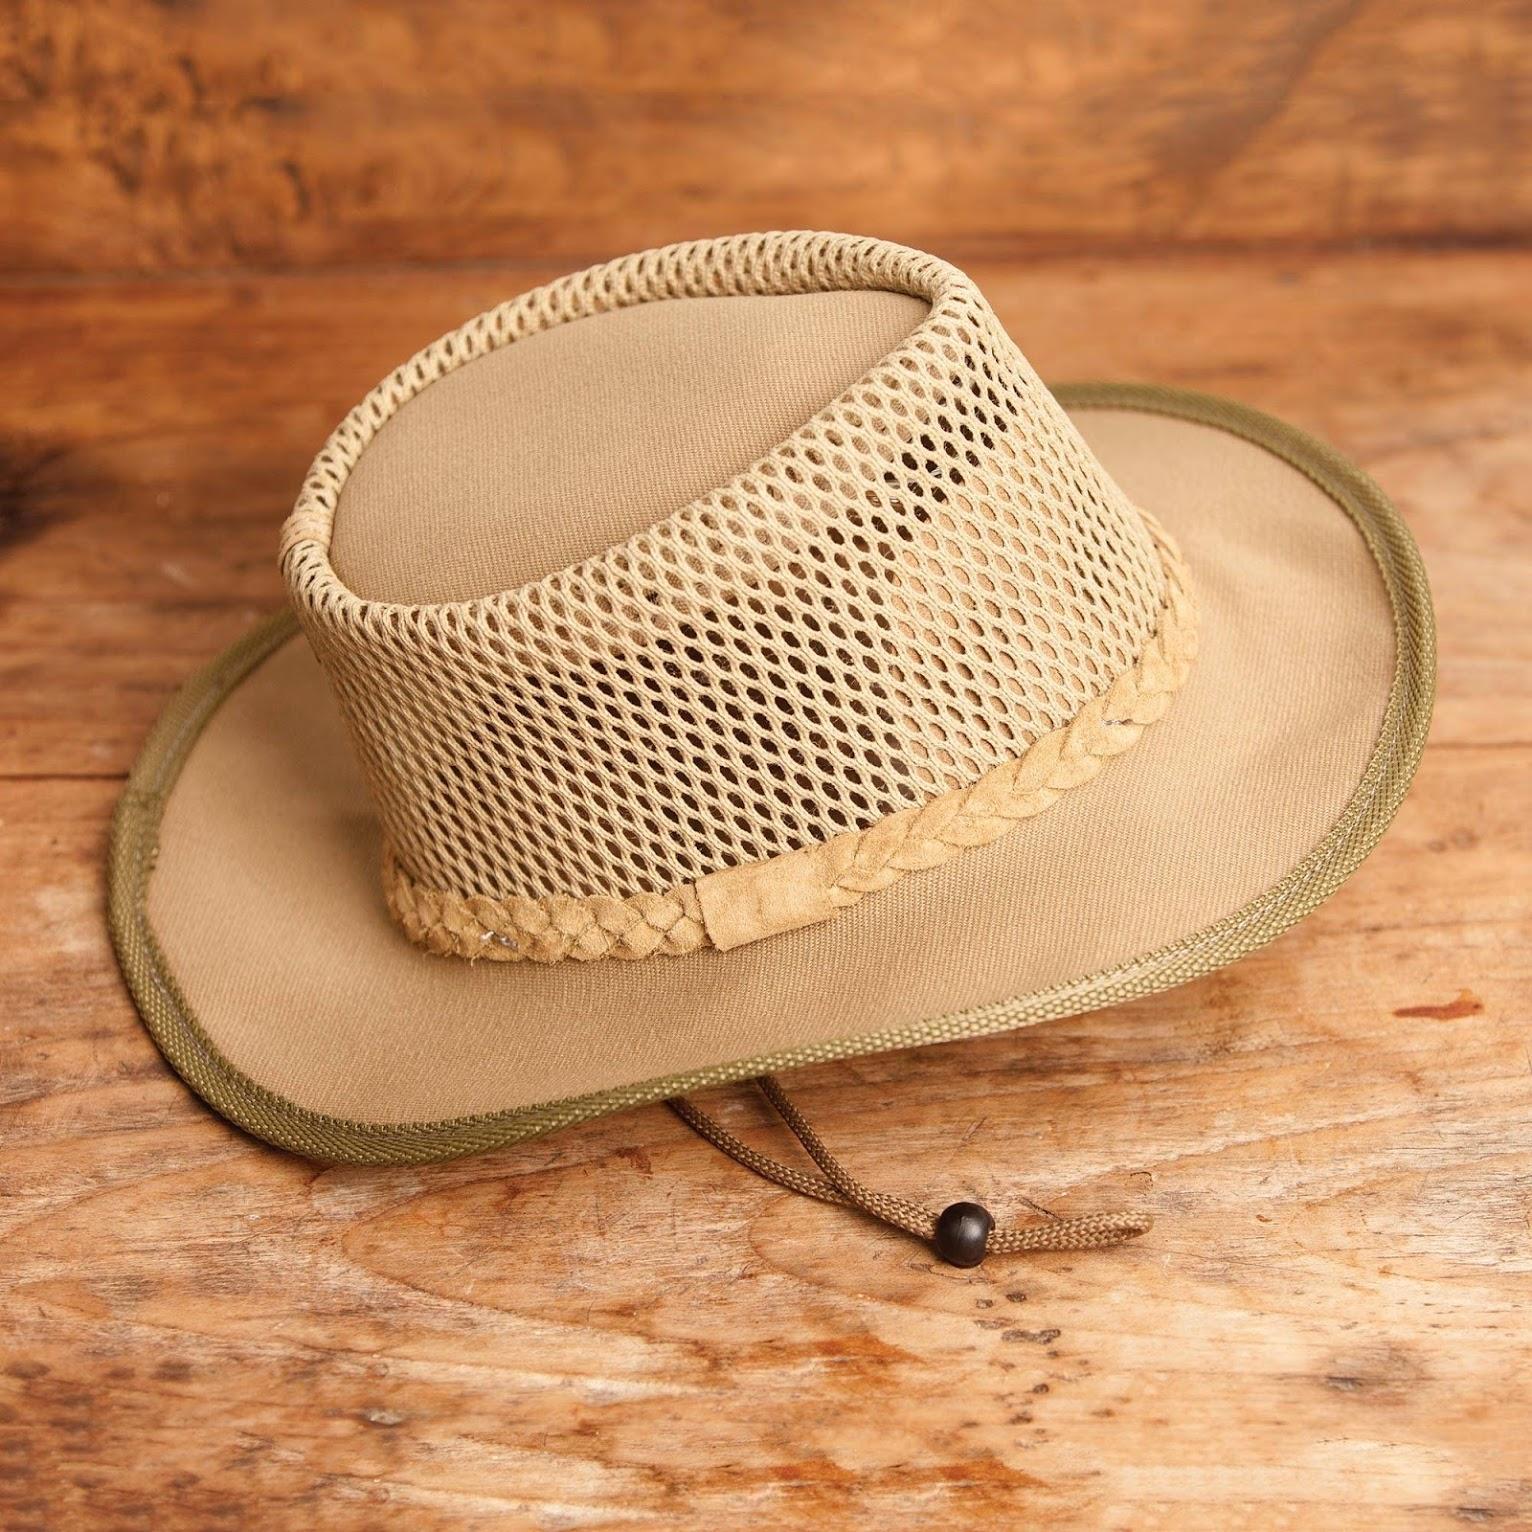 https://www.novica.com/p/mens-ventilated-african-mesh-ranger-hat/327205/